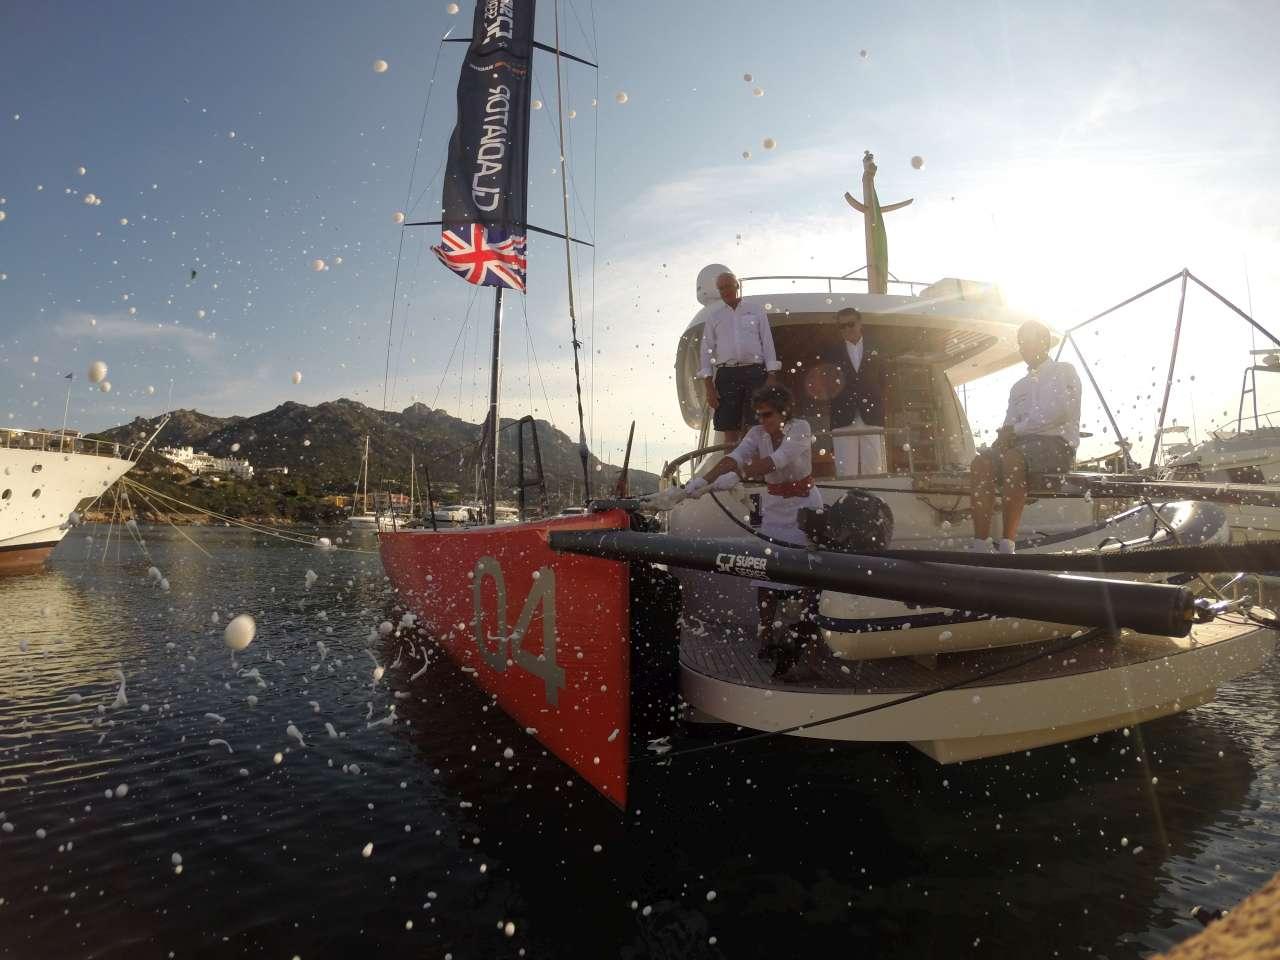 LO YCCS OSPITA IL BATTESIMO DEL NUOVO TP52 GLADIATOR - NEWS - Yacht Club Costa Smeralda